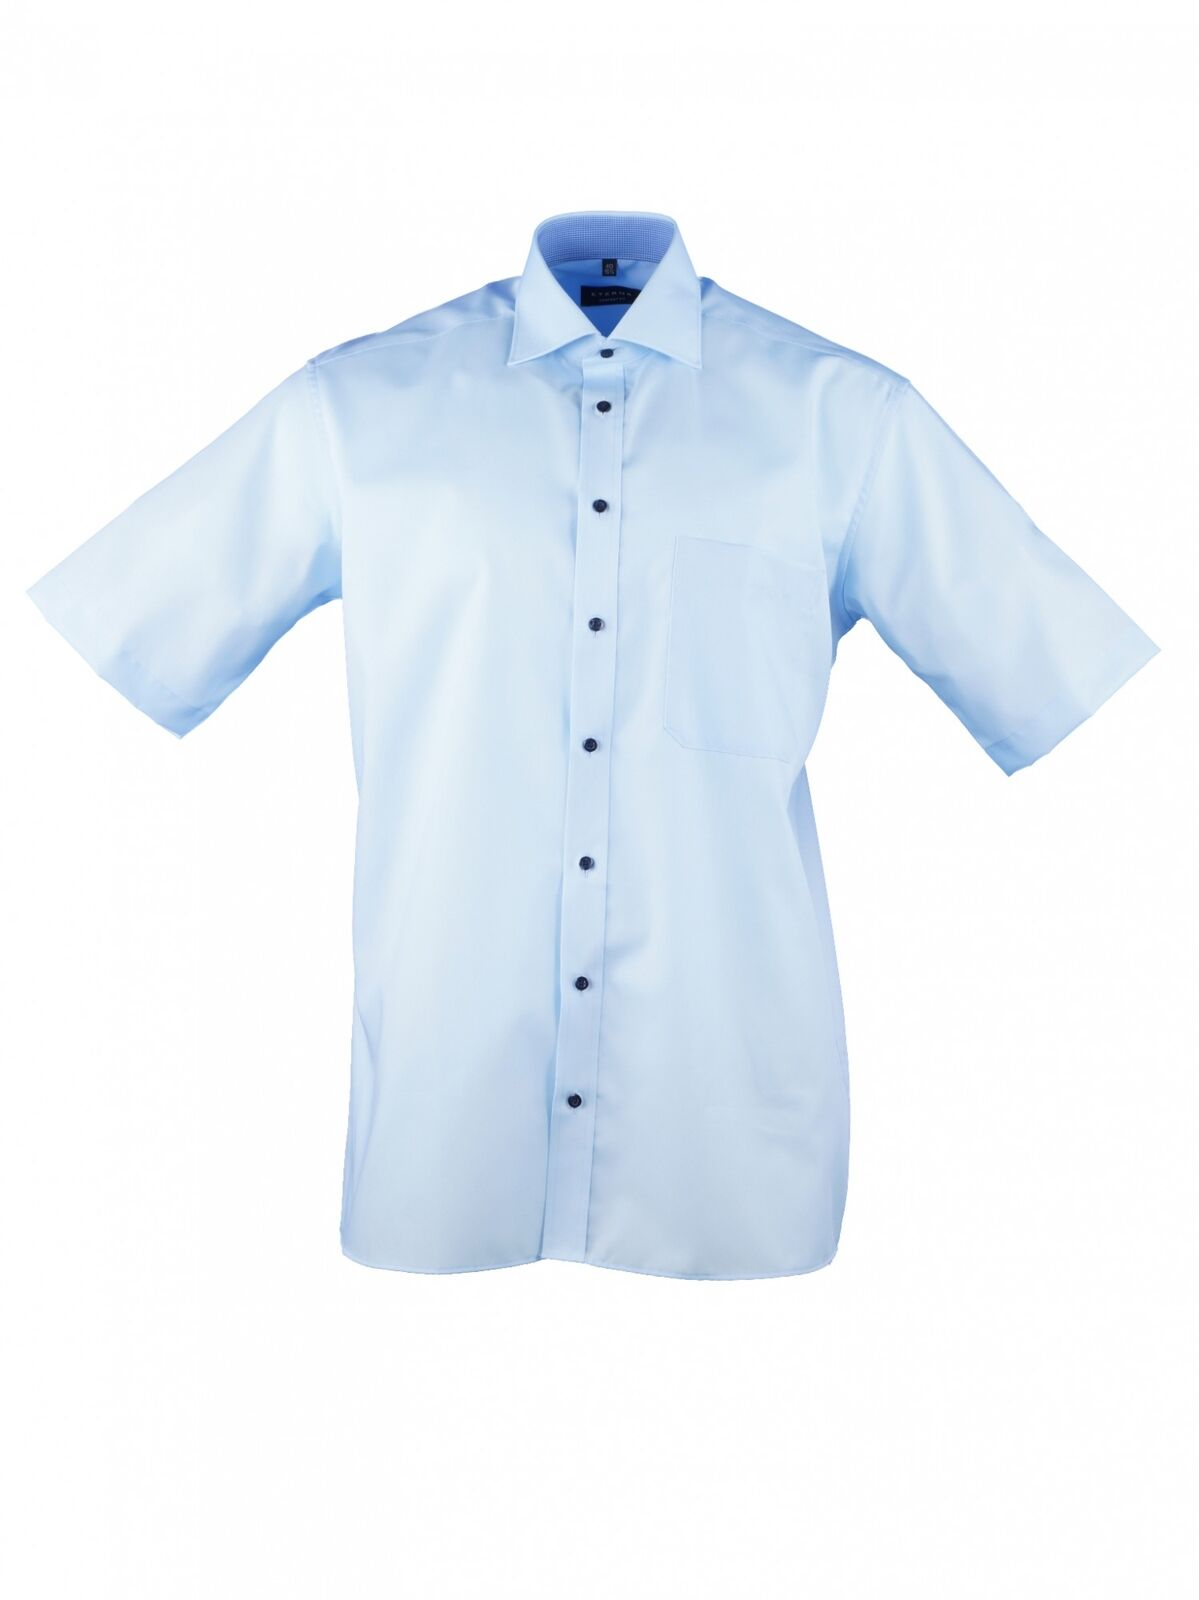 Eterna Herren Hemd Kurzarm L 42 Comfort Fit Blau 3215 11 K147      Feine Verarbeitung